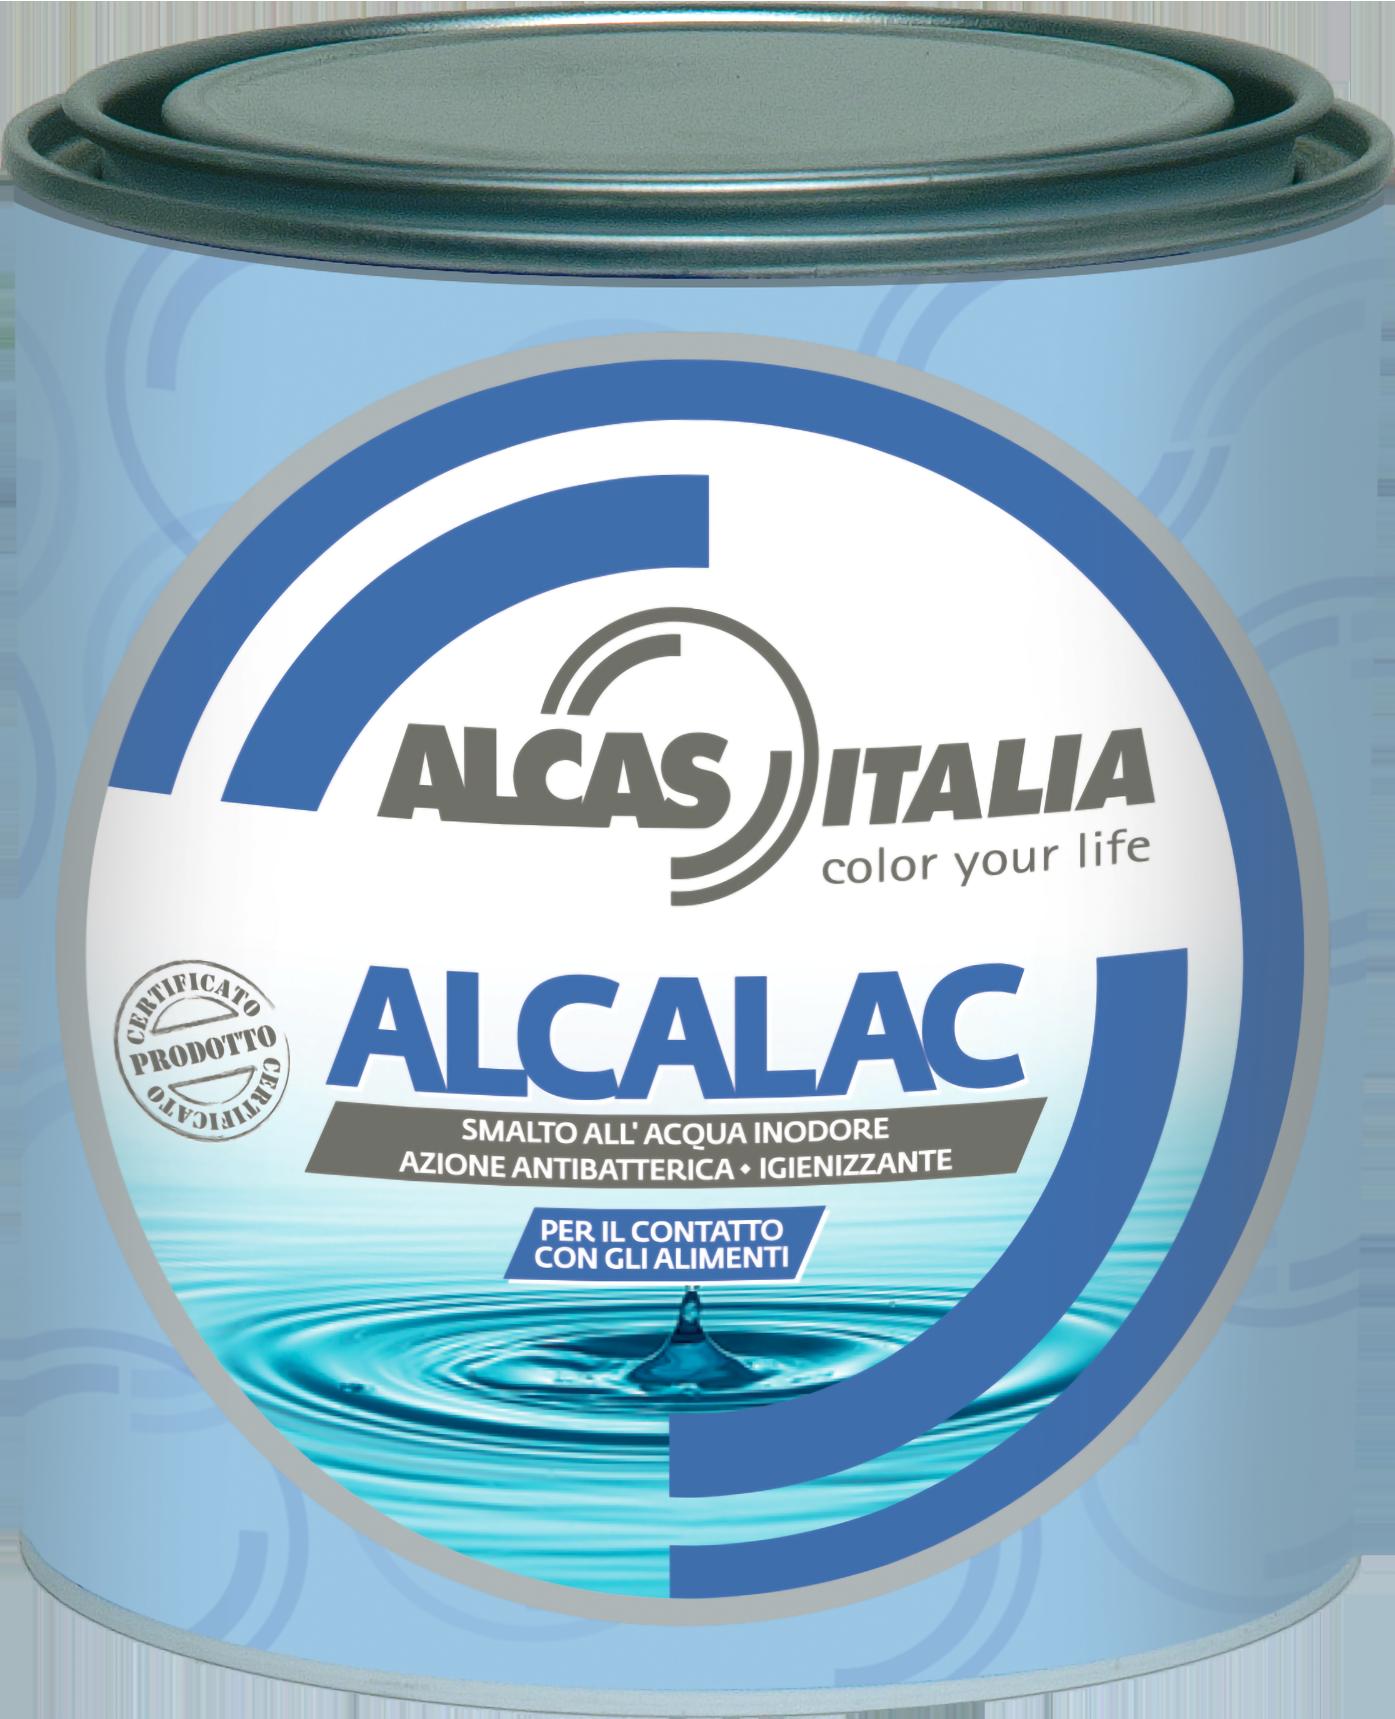 Alcalac